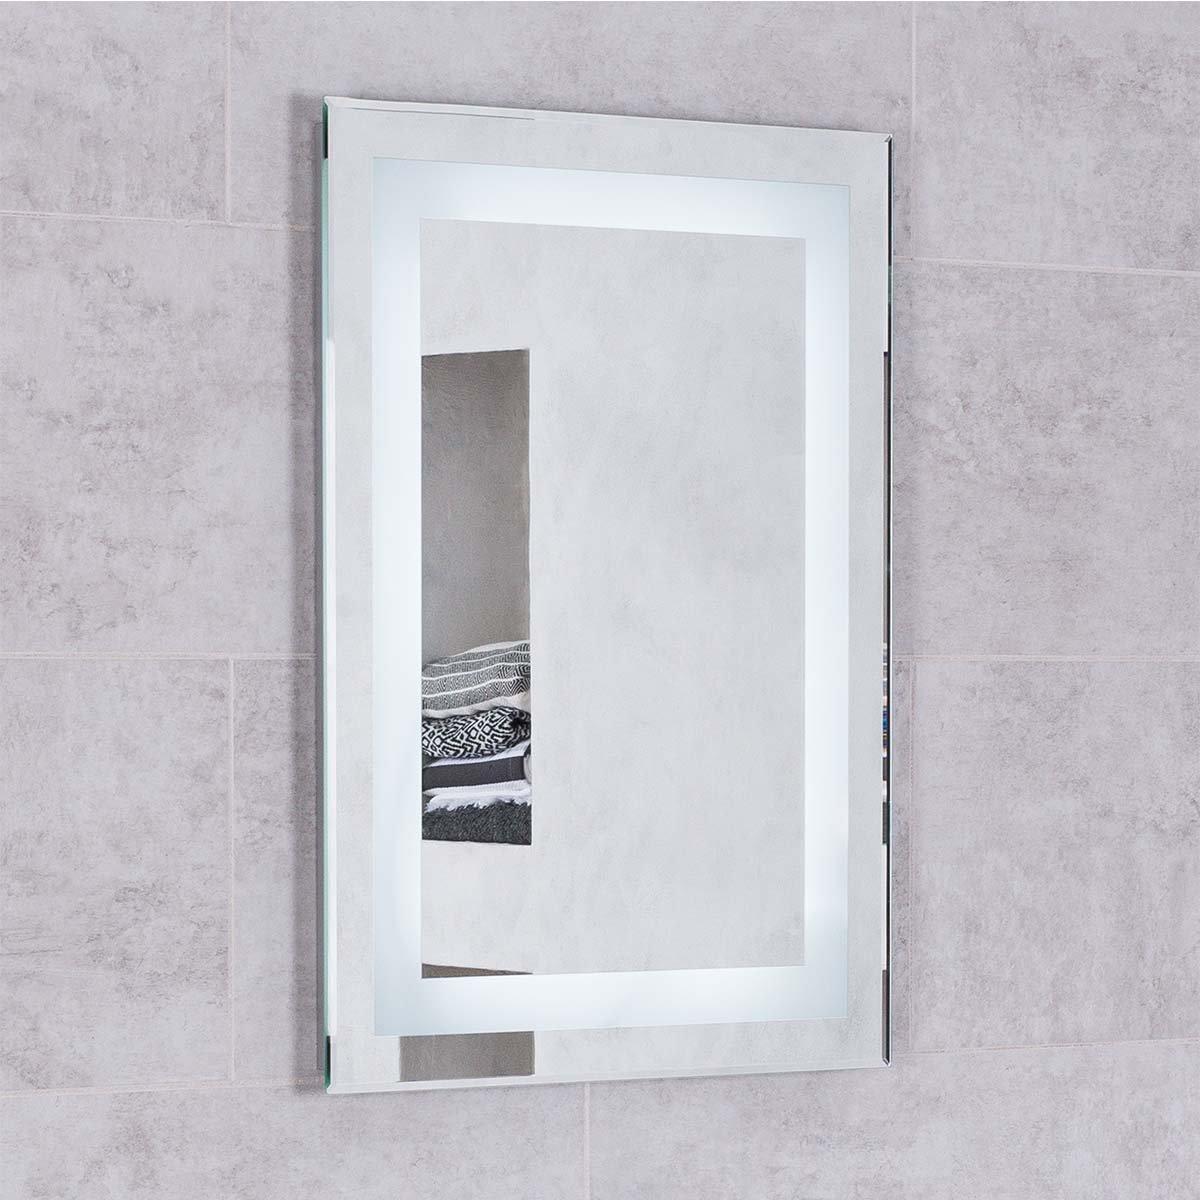 Blanc 800 x 600mm Illuminated LED Mirror with Demister & Shaver ...